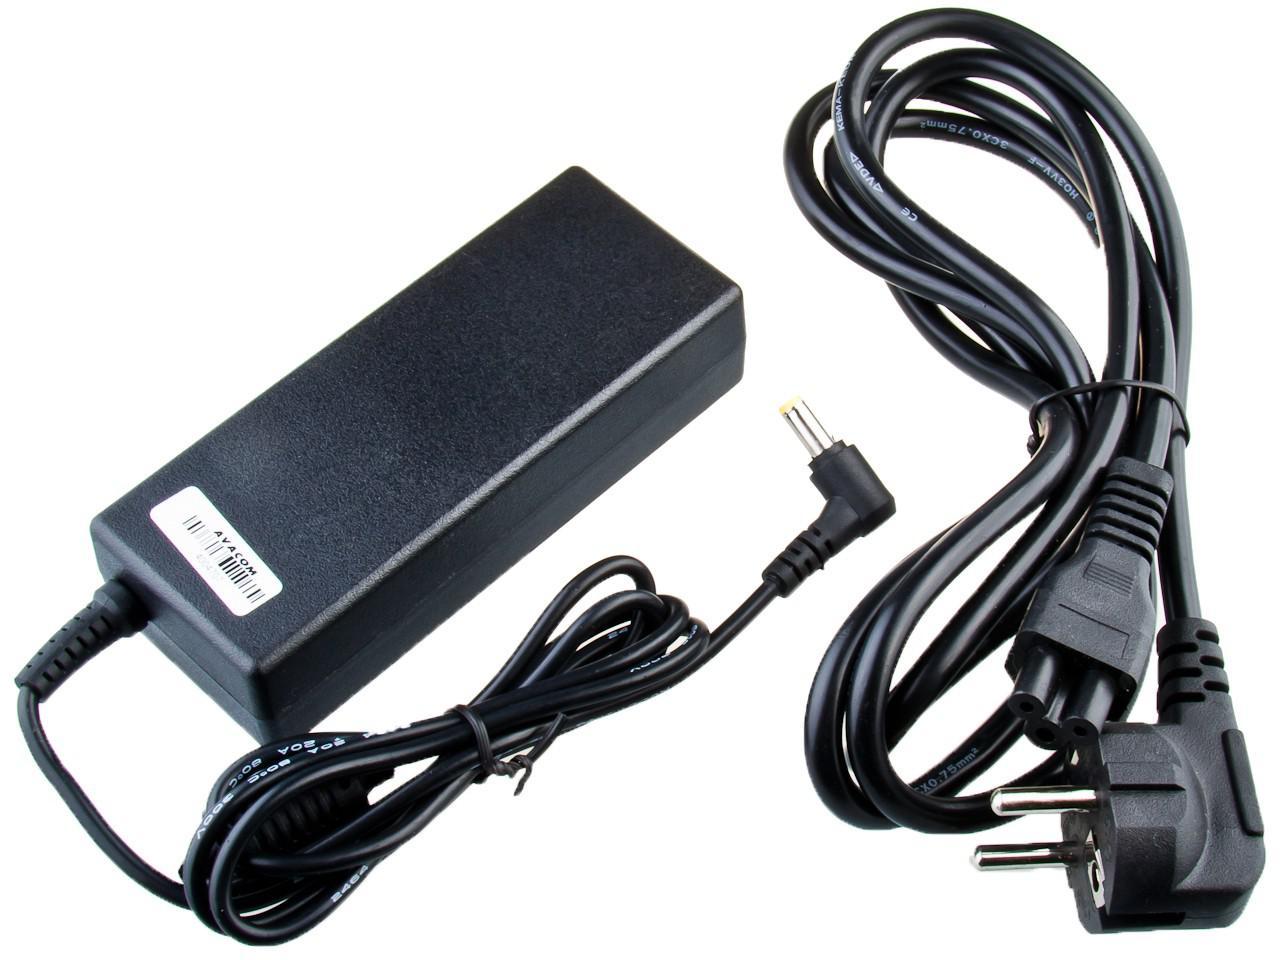 AVACOM Nabíjecí adaptér AVACOM ADAC-ACER-90W pro notebook Acer 19V 4,7A 90W konektor 5,5mm x 1,7mm (ADAC-ACER-90W)